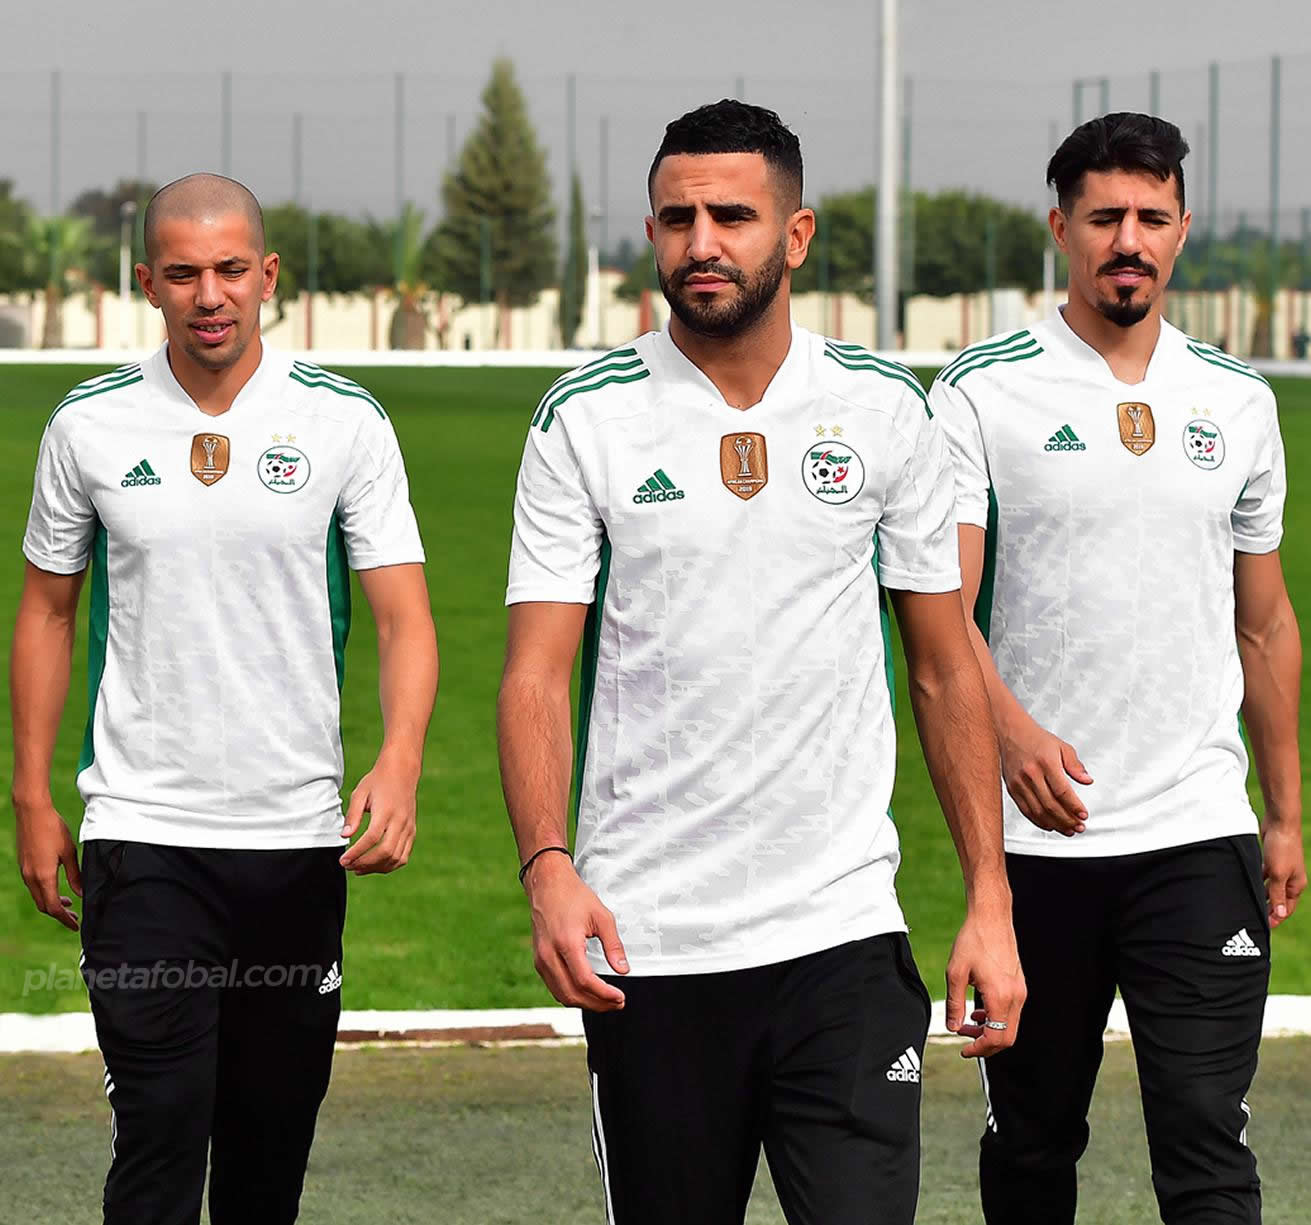 Camiseta adidas de Argelia 2020/21 | Imagen FAF